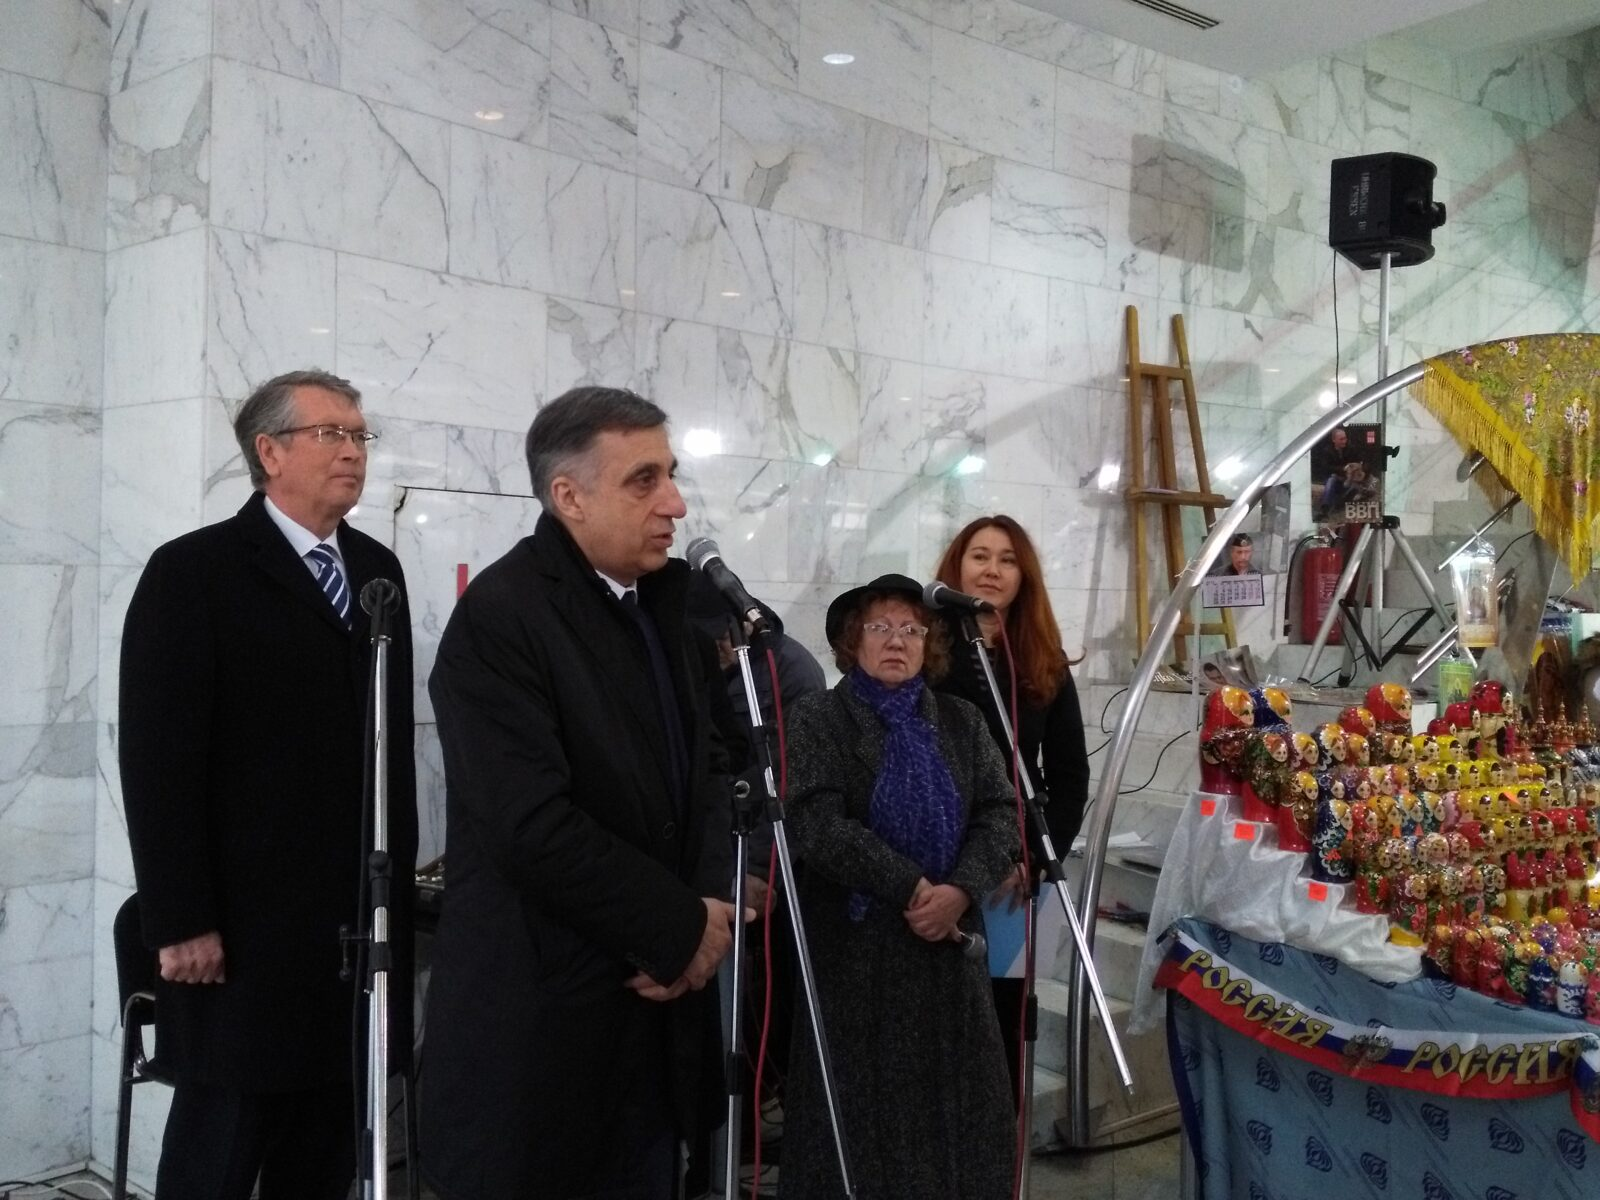 Чепурин отворио Фестивал руско-српског занатства у Београду (ФОТО)